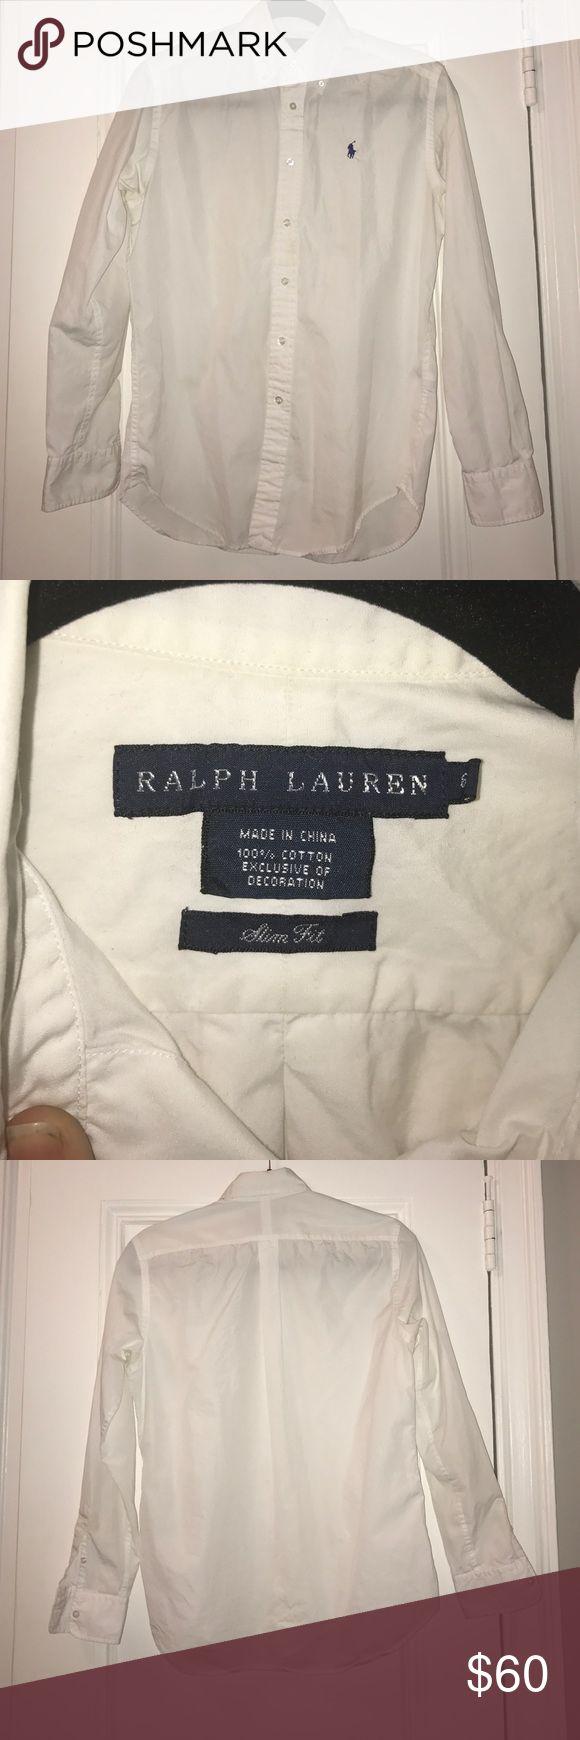 Ralph Lauren white Slim Fit button down shirt Ralph Lauren white Slim Fit button down shirt Ralph Lauren Tops Button Down Shirts